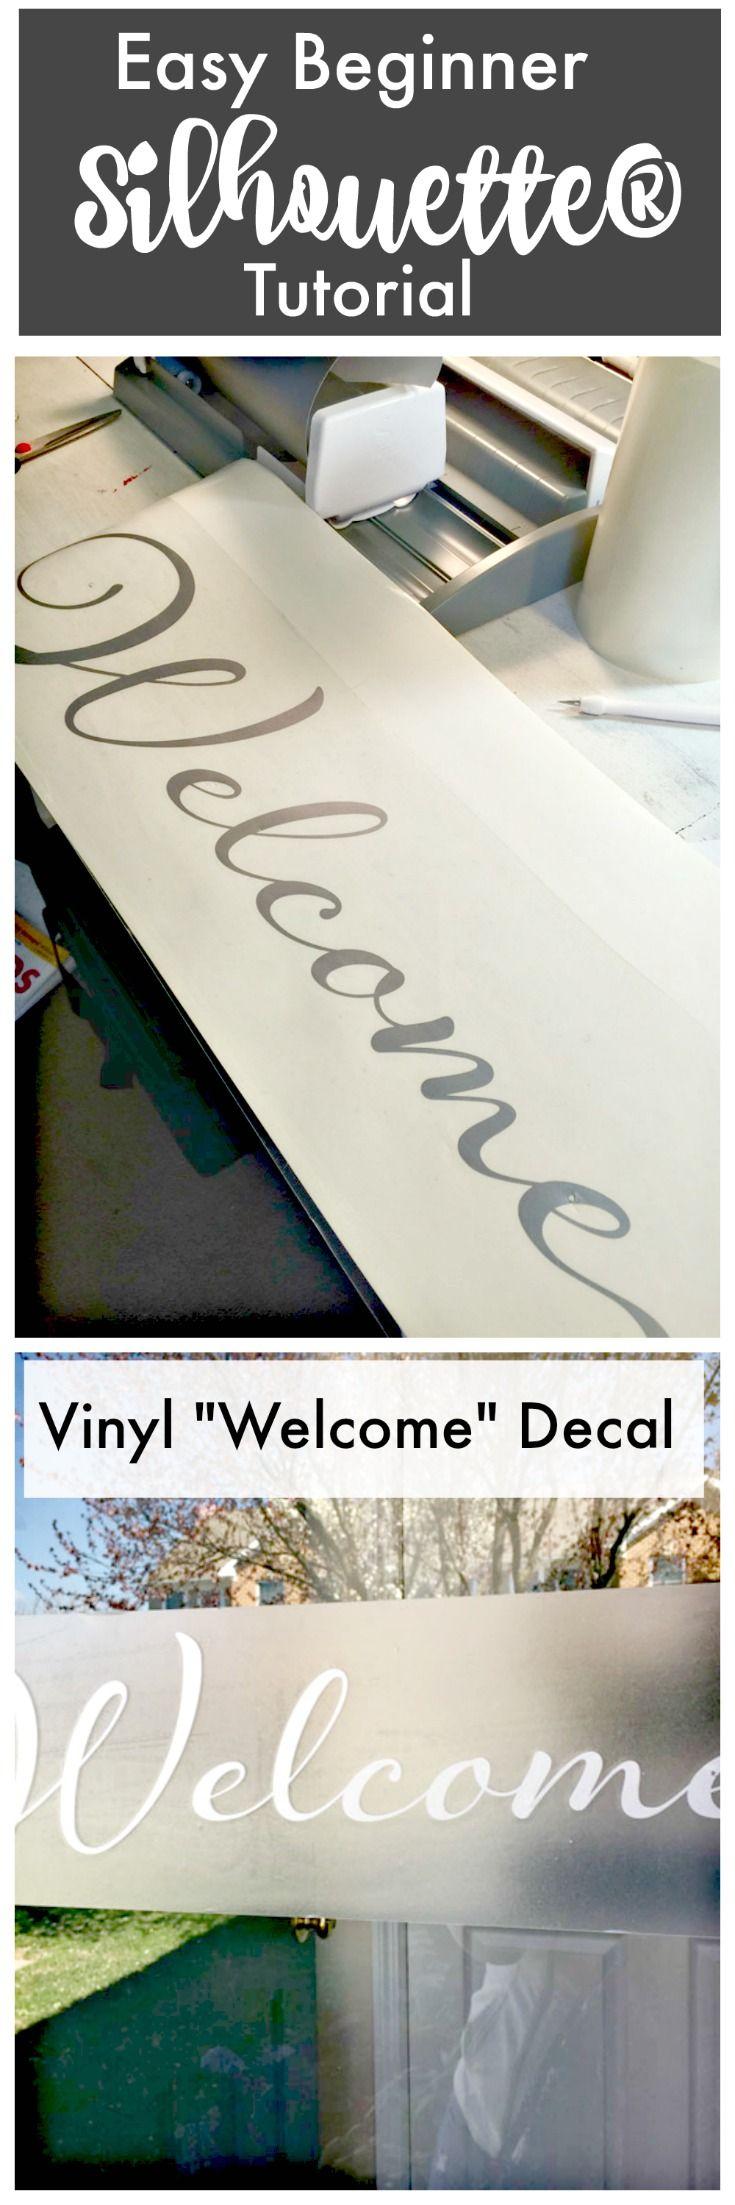 A Simple Vinyl Welcome Front Door Decal Is A Great